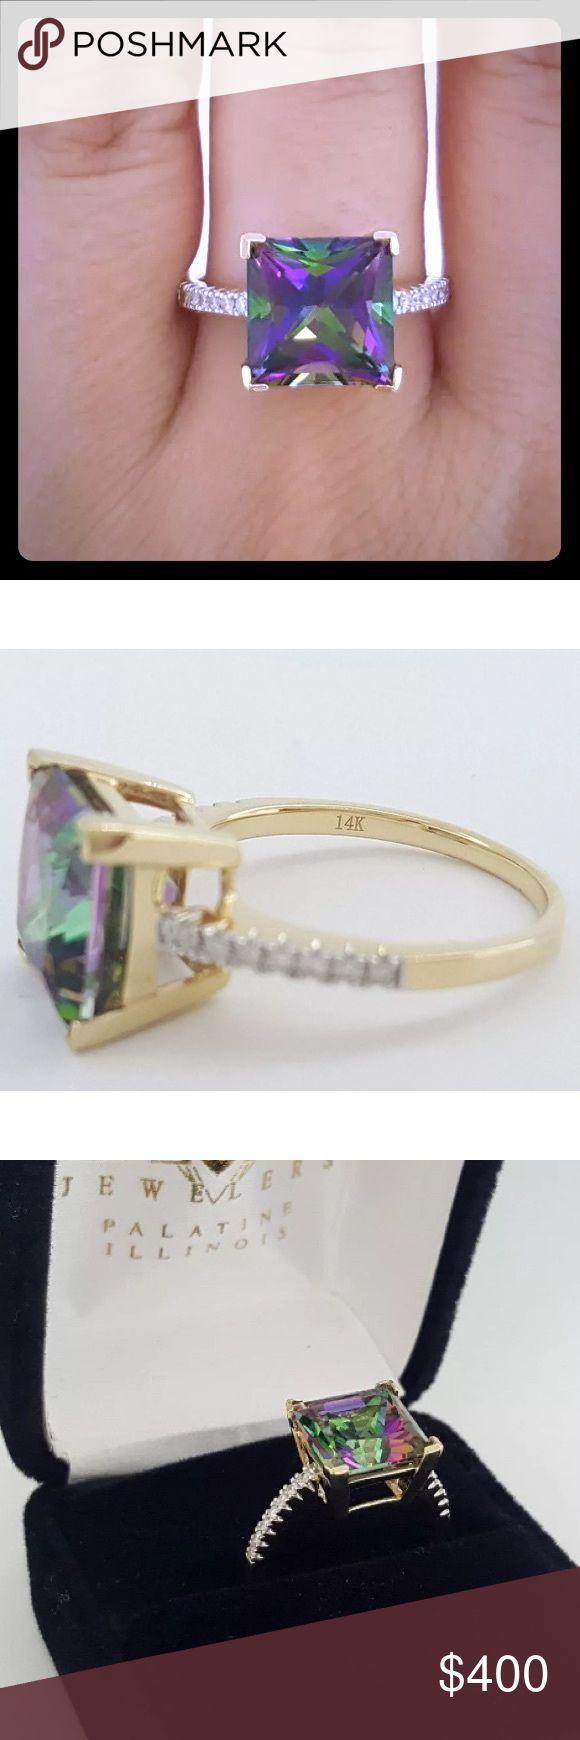 4 carat mystic topaz/0.20 carat diamond ring! 14k 4 carat mystic topaz/0.20 carat diamond ring! 14k yellow gold! Jewelry Rings